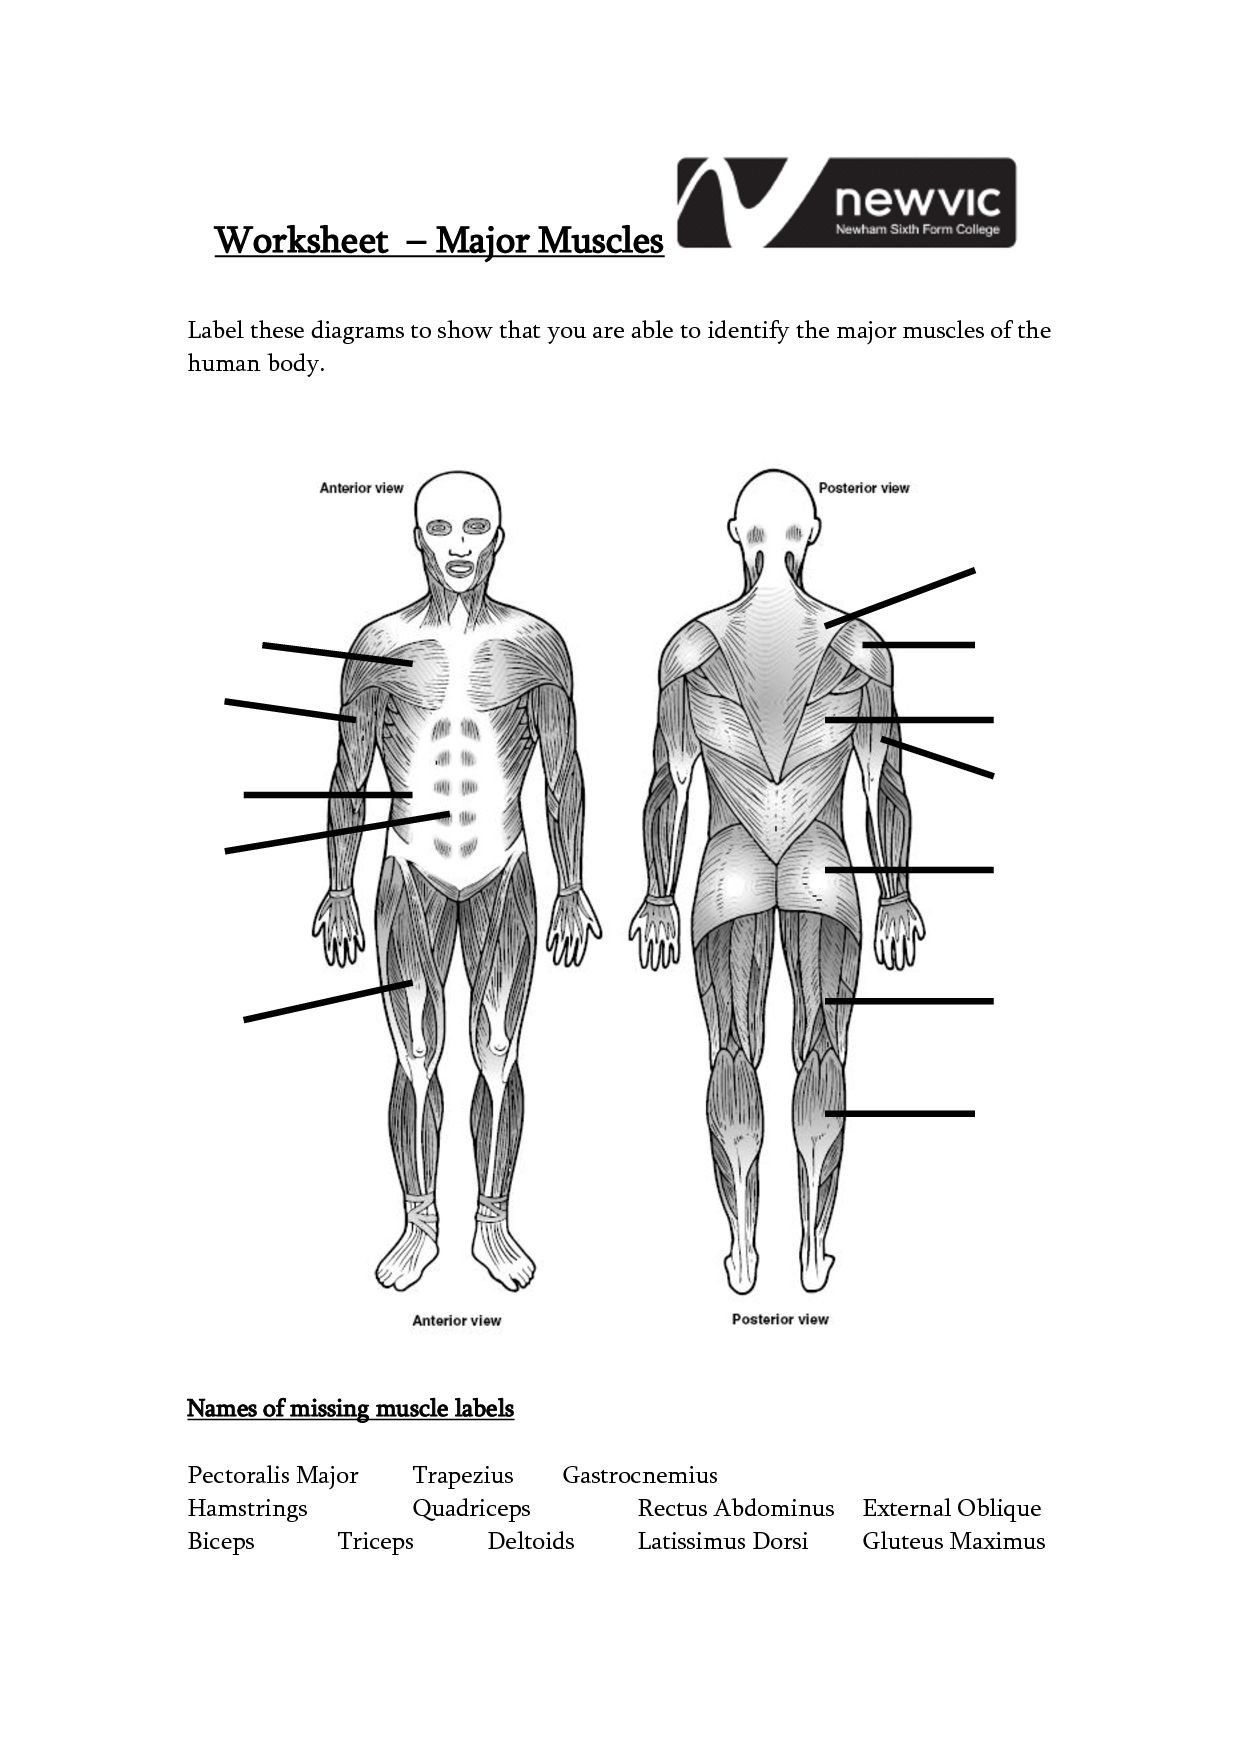 Printable Anatomy Labeling Worksheets Human Muscle Worksheet Label The Muscles Worksheet Skeletal System Worksheet Muscle Diagram Kids Worksheets Printables